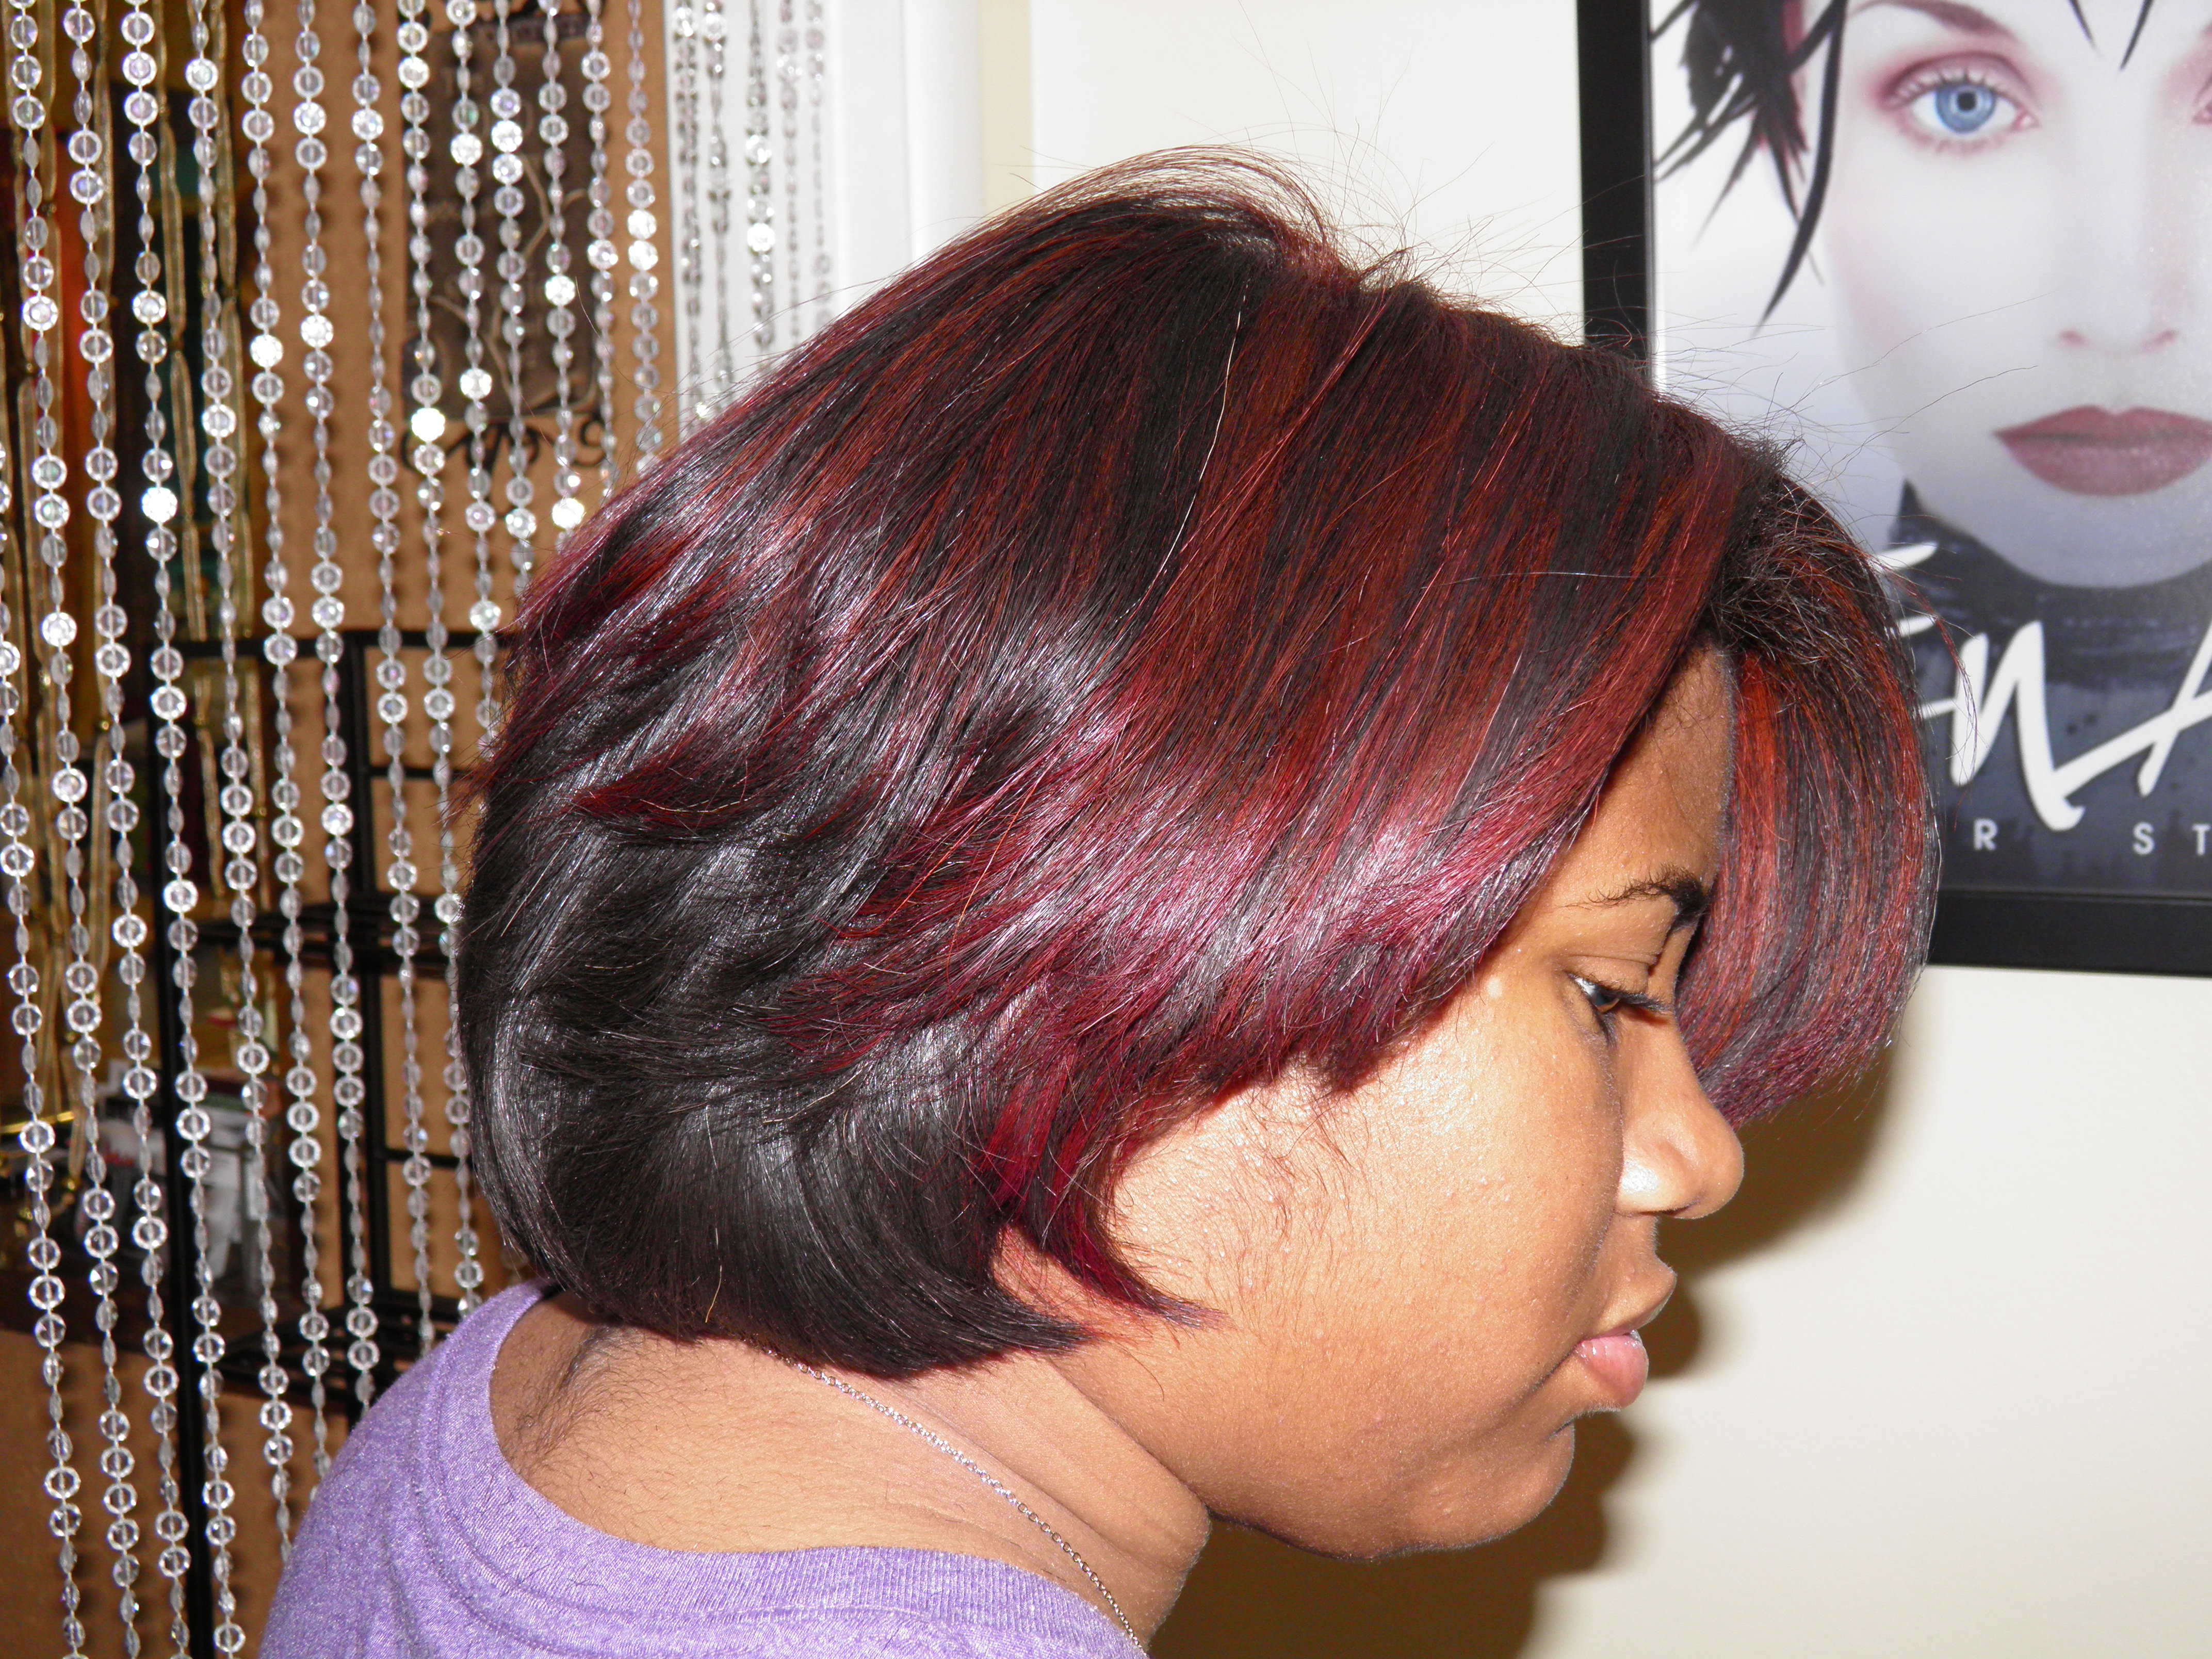 Healthy Hair By Rhonda - Creative hairstyle color